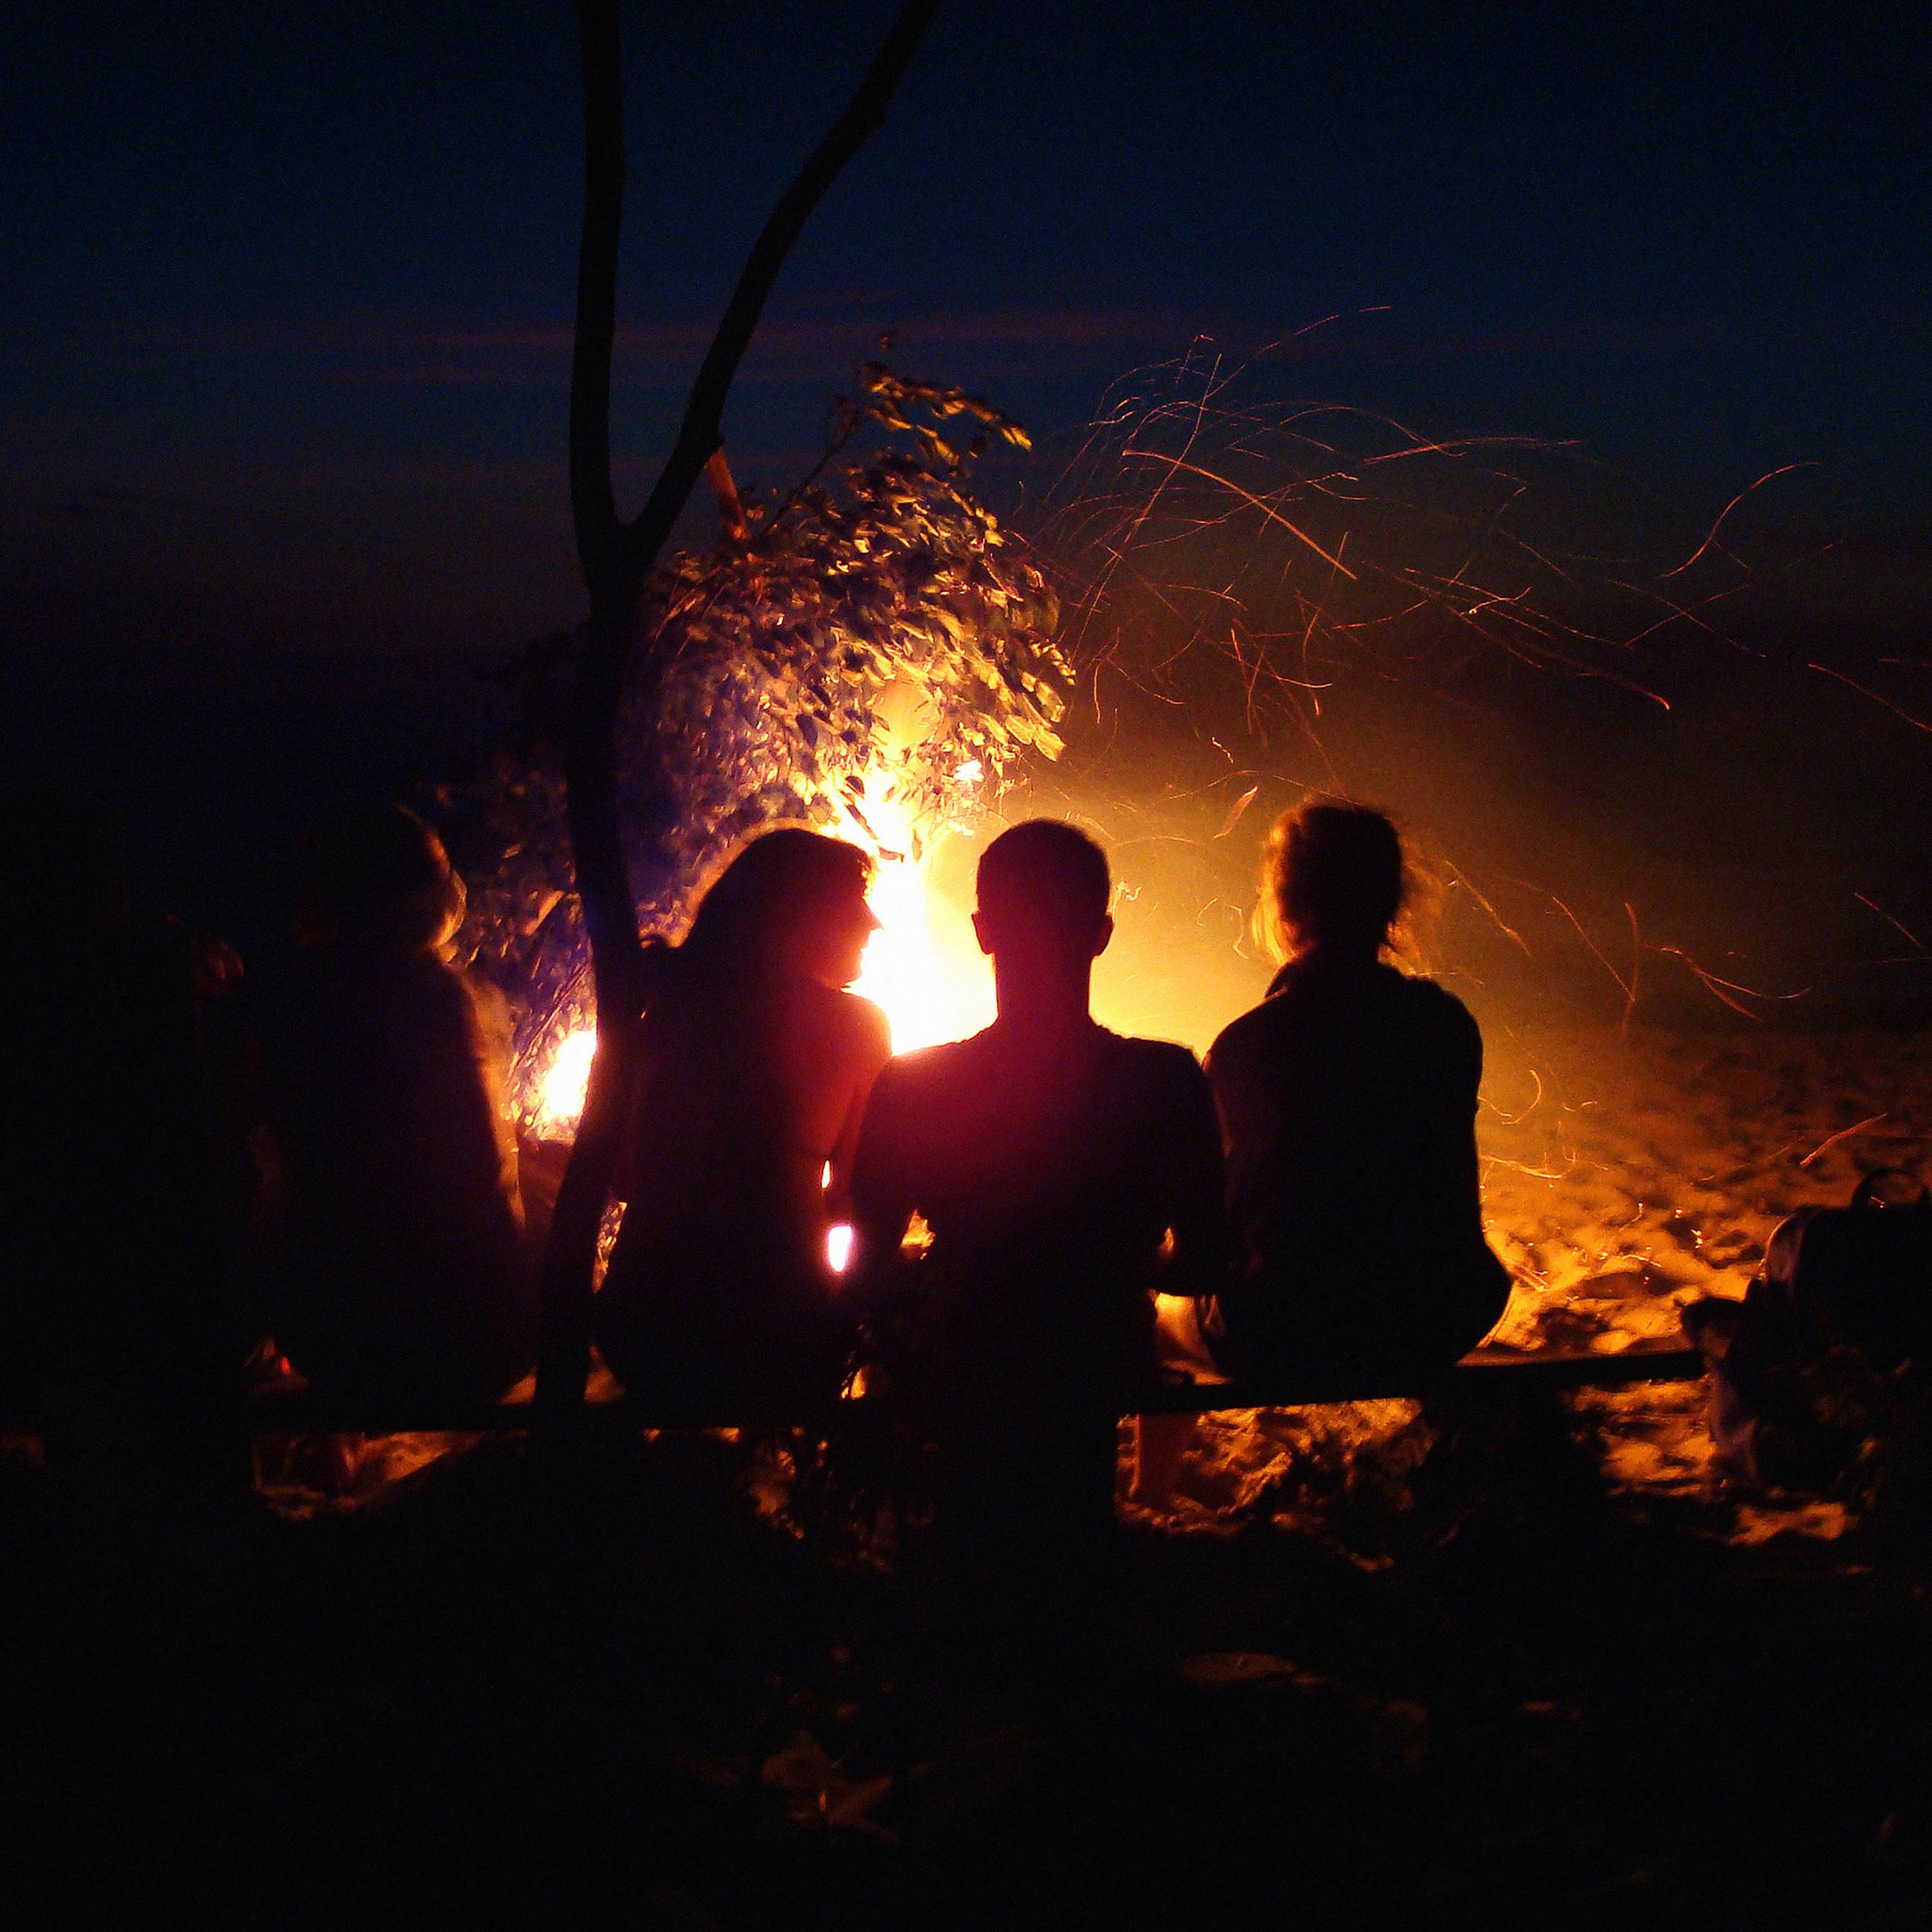 Mc07 Wallpaper Beach Bonfire Night Camp Papers Co